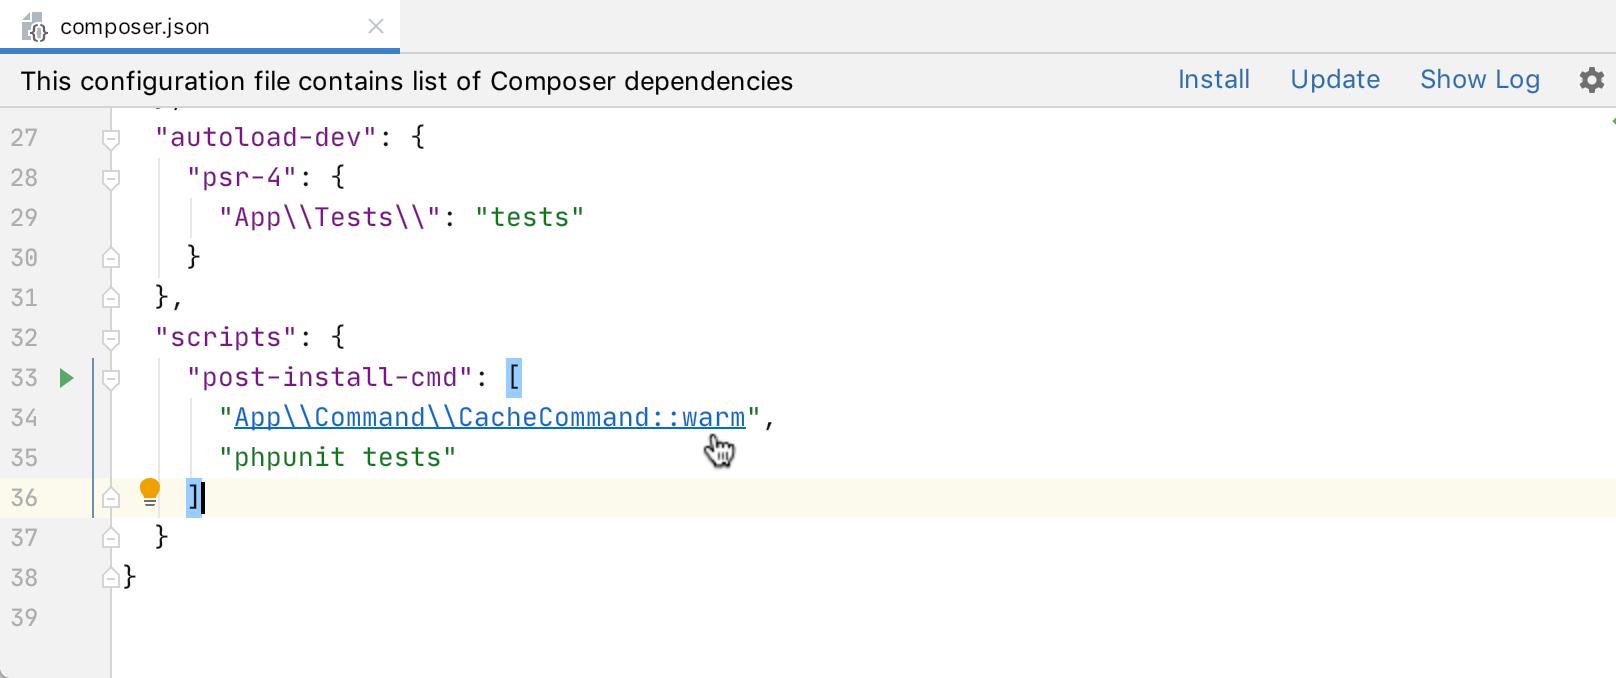 composer-json_scripts_completion@2x